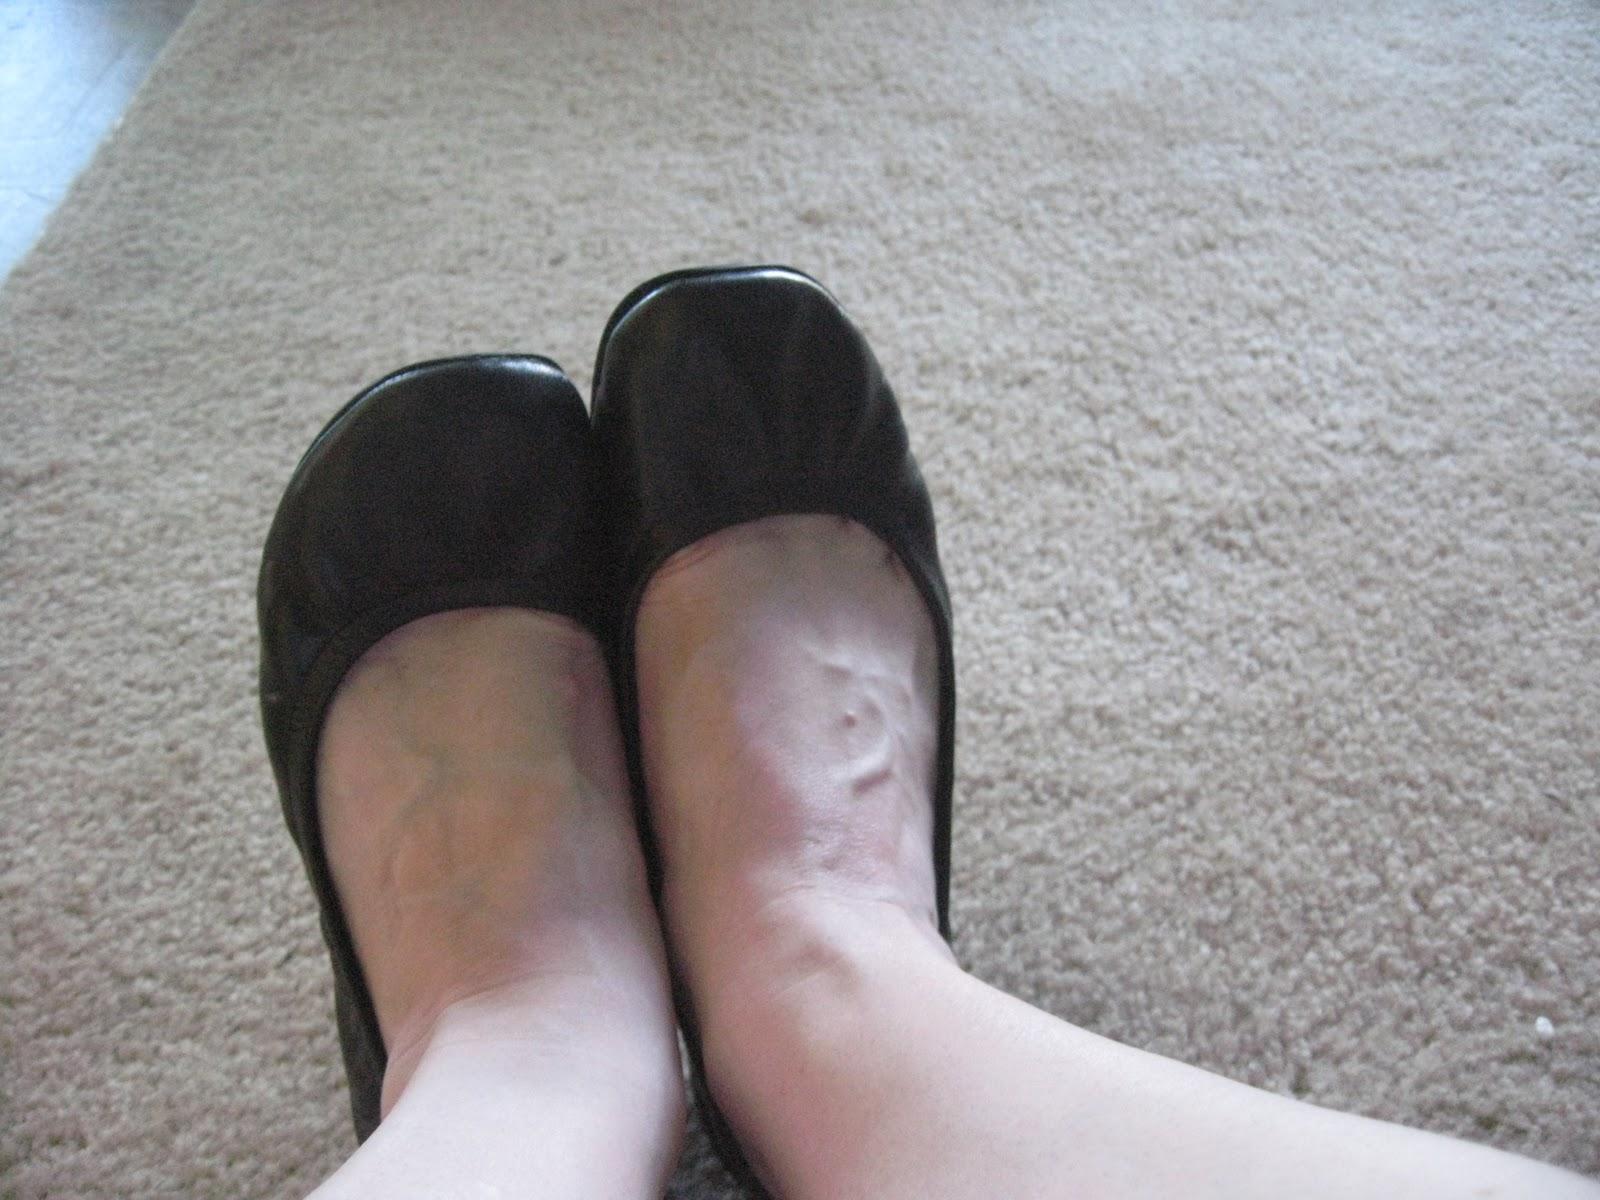 Trashed Harrison Idaho T Bar Shoes With Blue Socks